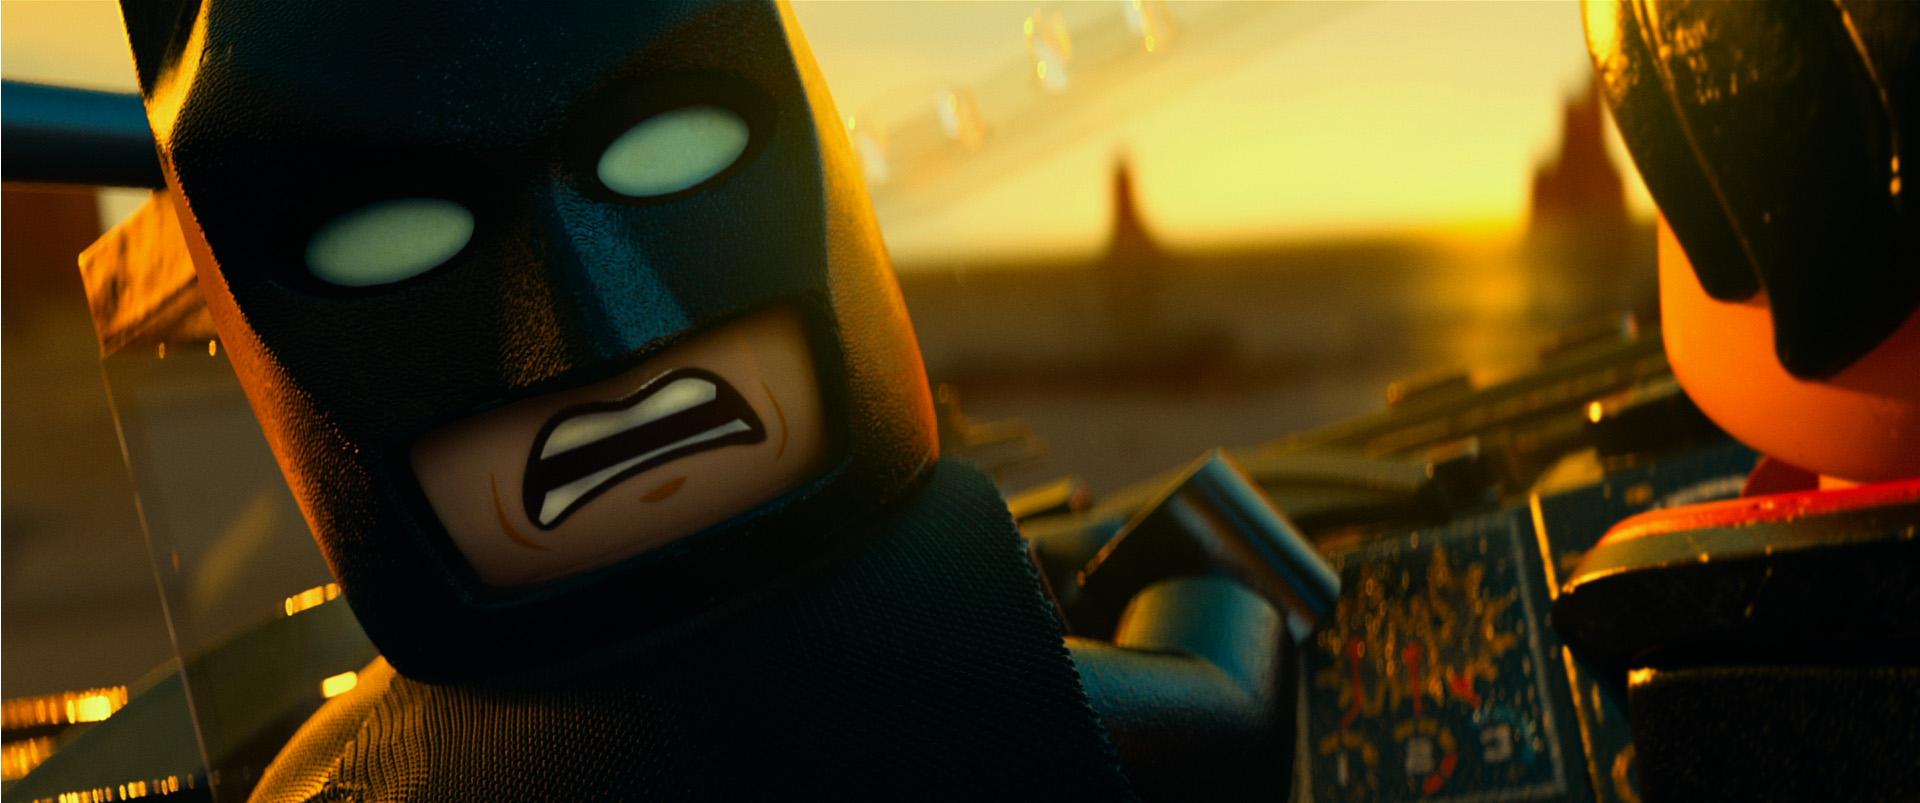 LEGO_jelenetfoto (7).jpg